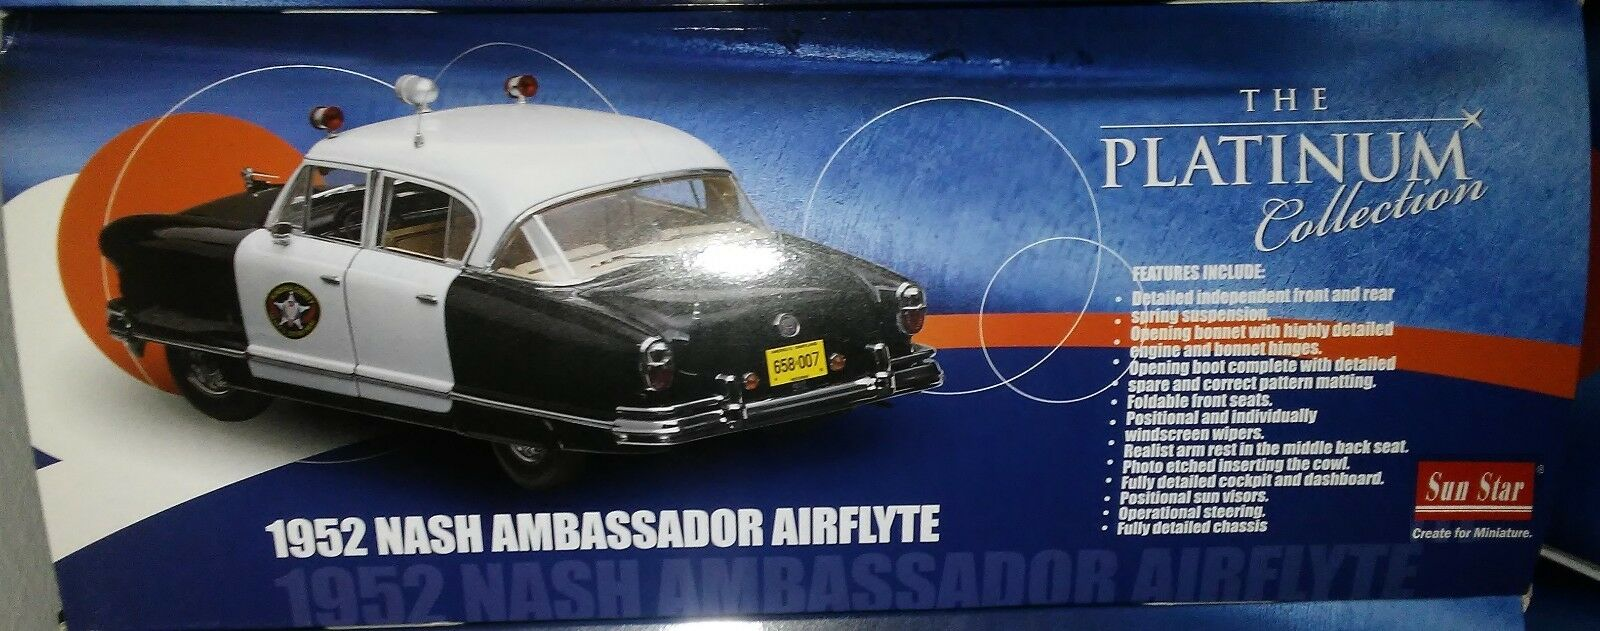 1952 NASH AMBASSADOR AIRFLYTE POLICE Diecast 9inch SUNSTAR 1:18 PLATINUM SS 5115